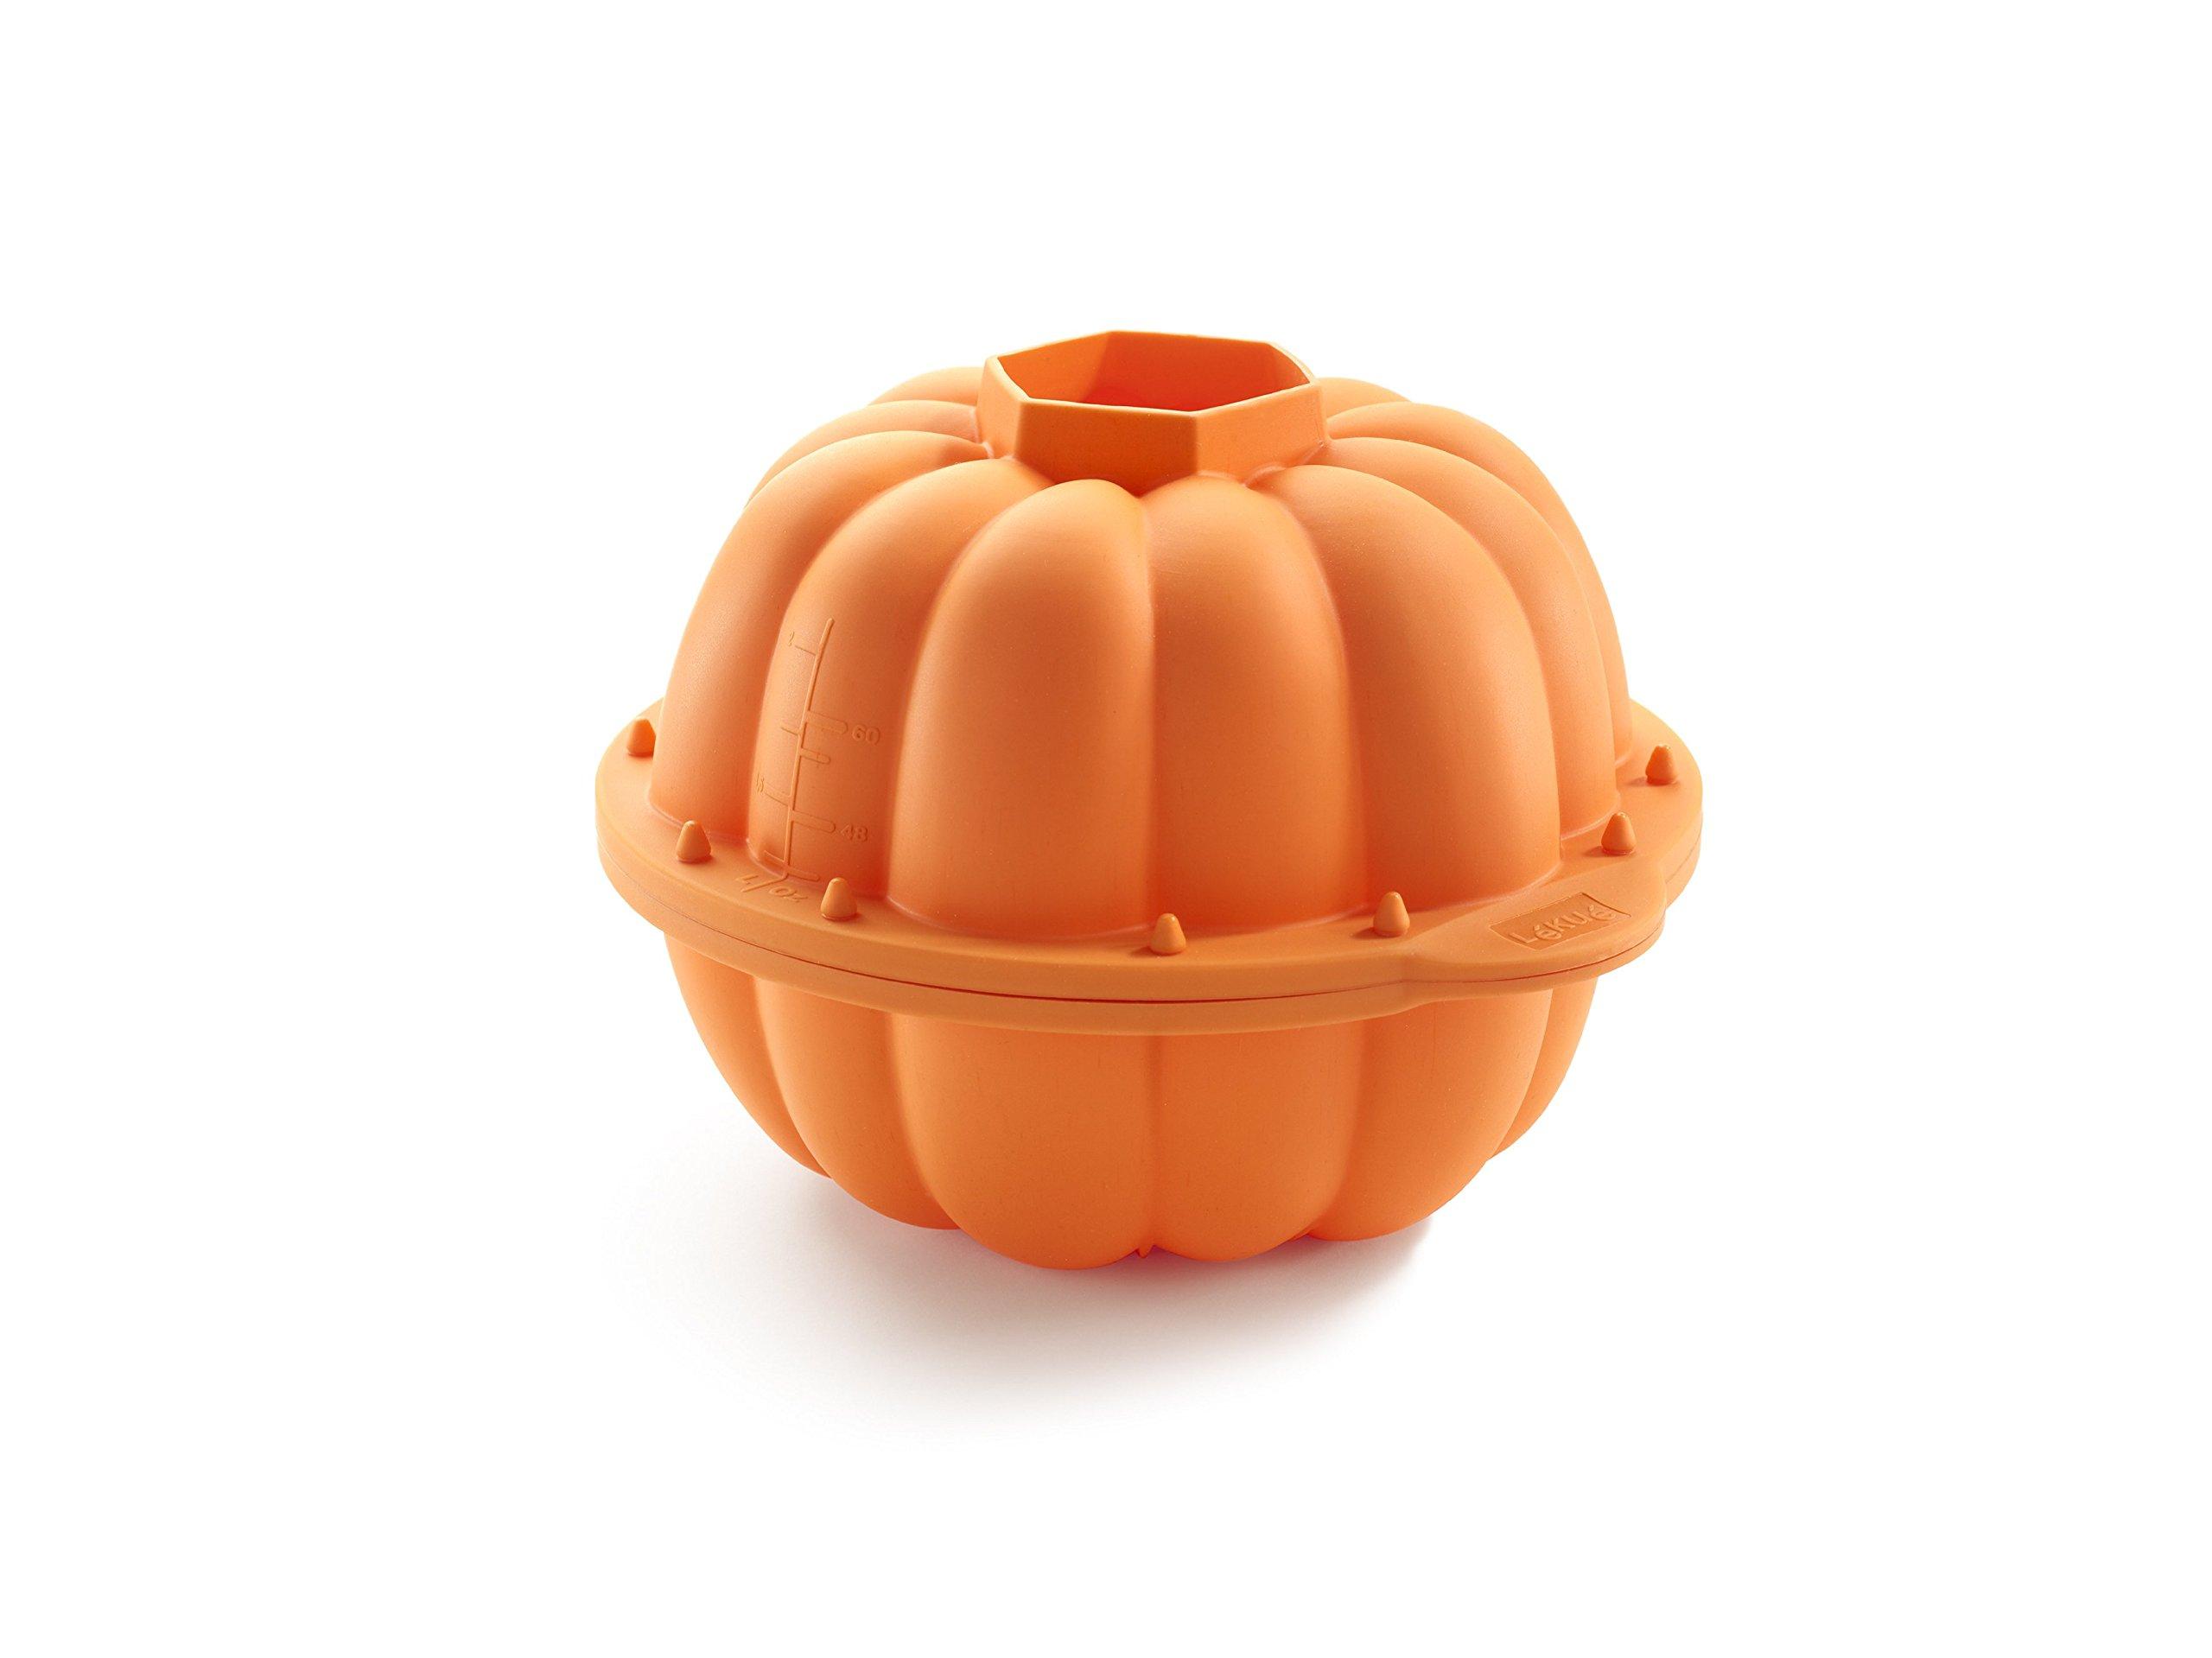 Lekue Pumpkin 3D Mold, Orange by Lekue (Image #1)